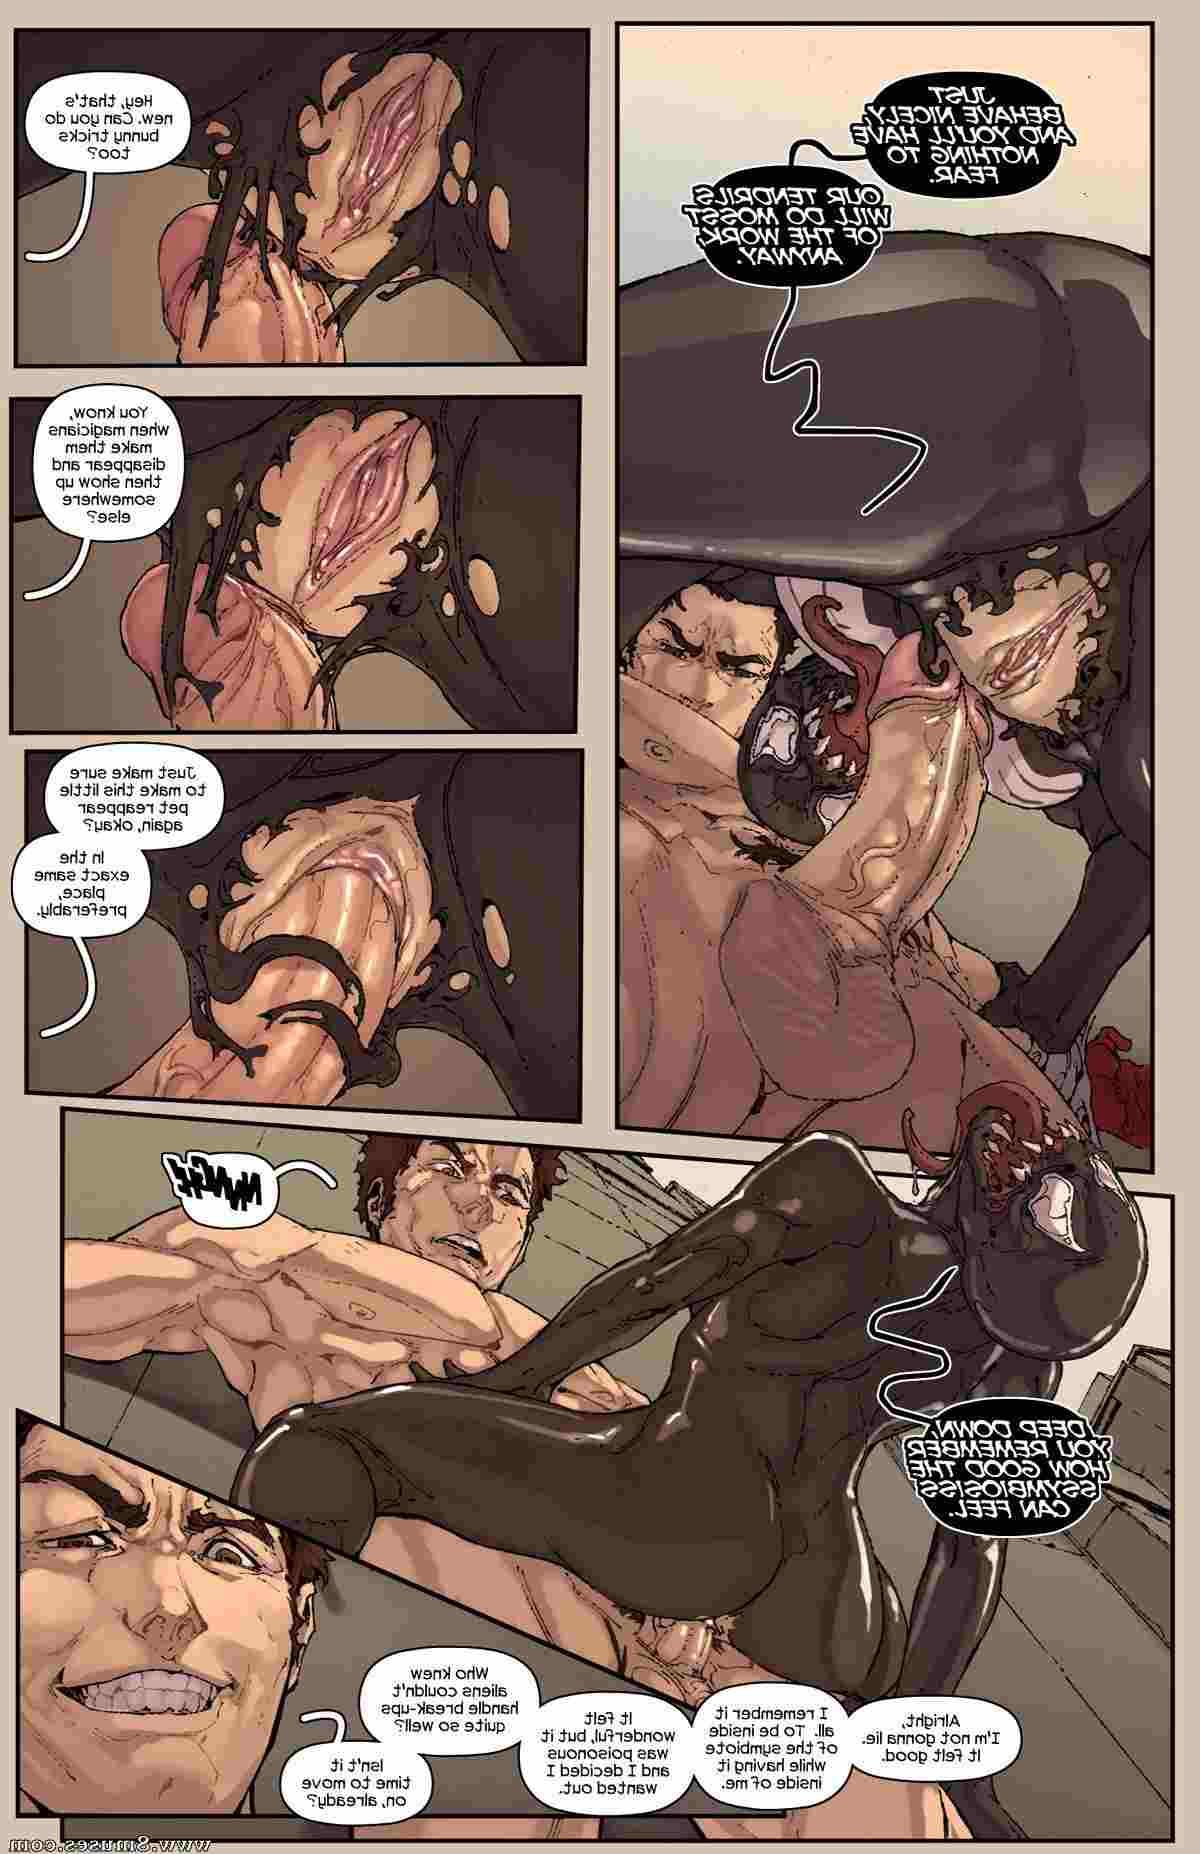 Tracy-Scops-Comics/Venomess Venomess__8muses_-_Sex_and_Porn_Comics_6.jpg